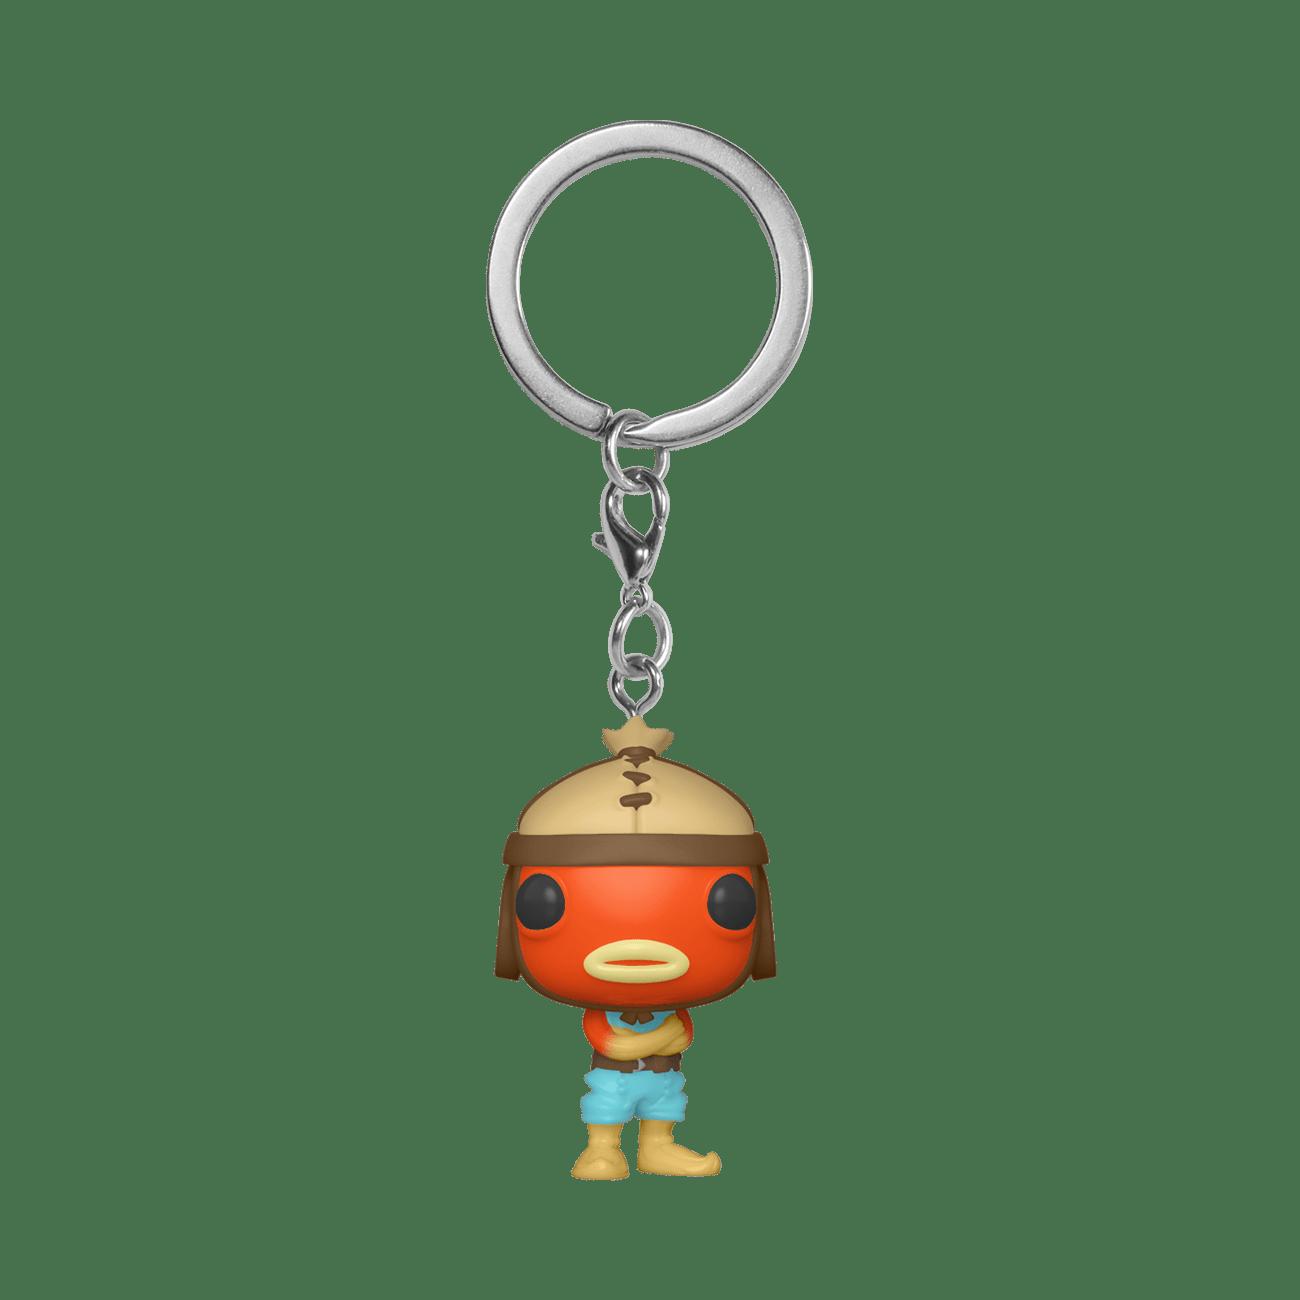 POP! Fortnite: Fishstick Keychain